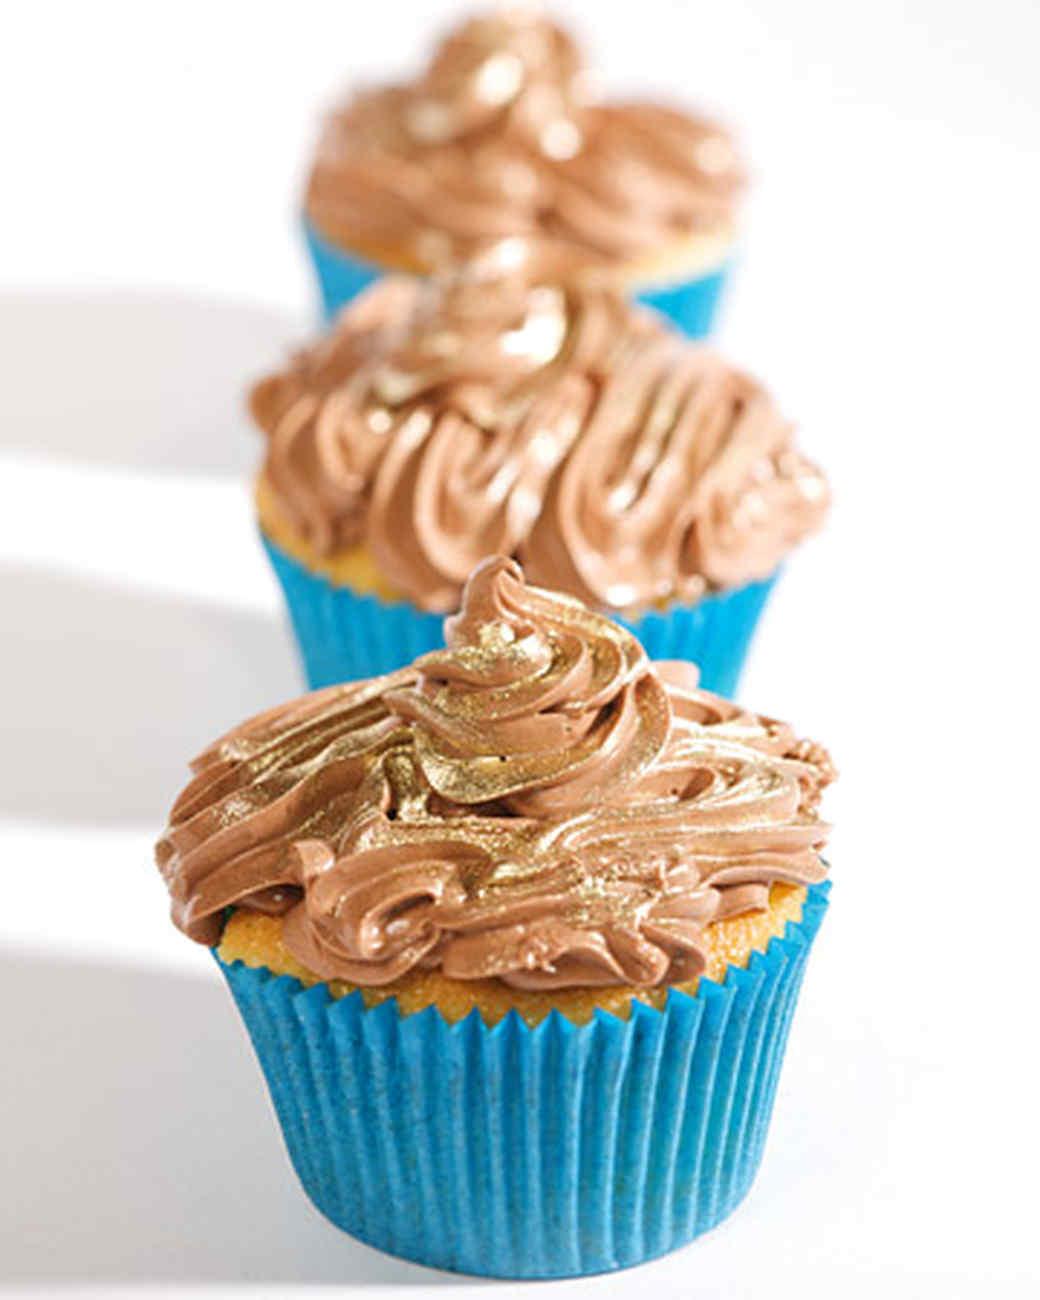 3135_040408_cupcakes.jpg